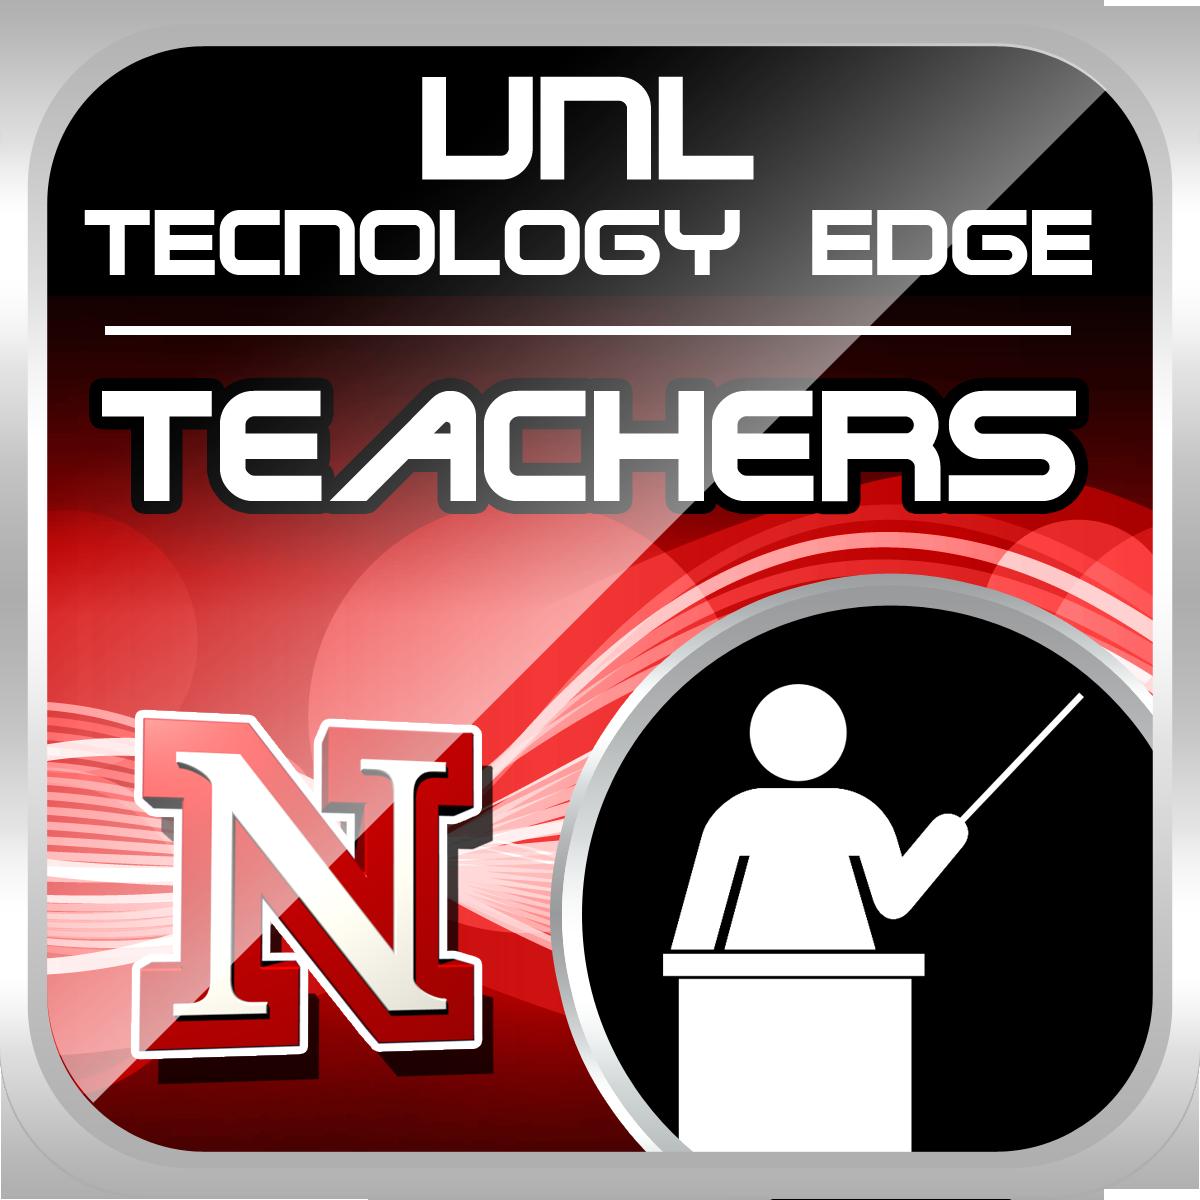 Tech EDGE - For Teachers Image